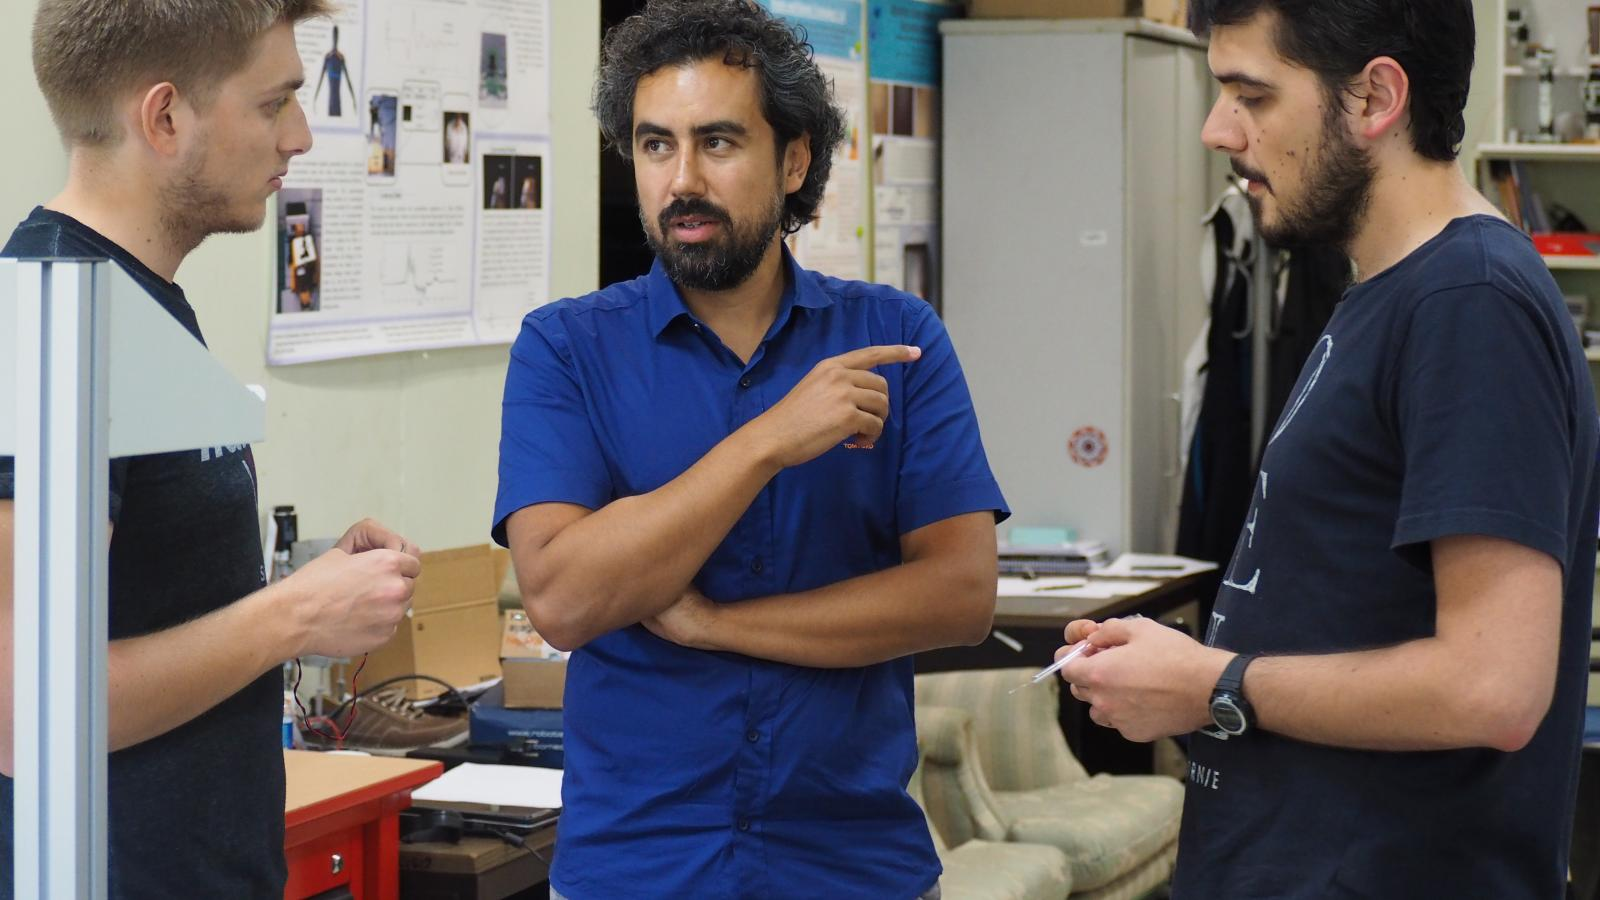 Boğaziçi University Is Developing a Robot for Pain Free, Rapid Colonoscopy